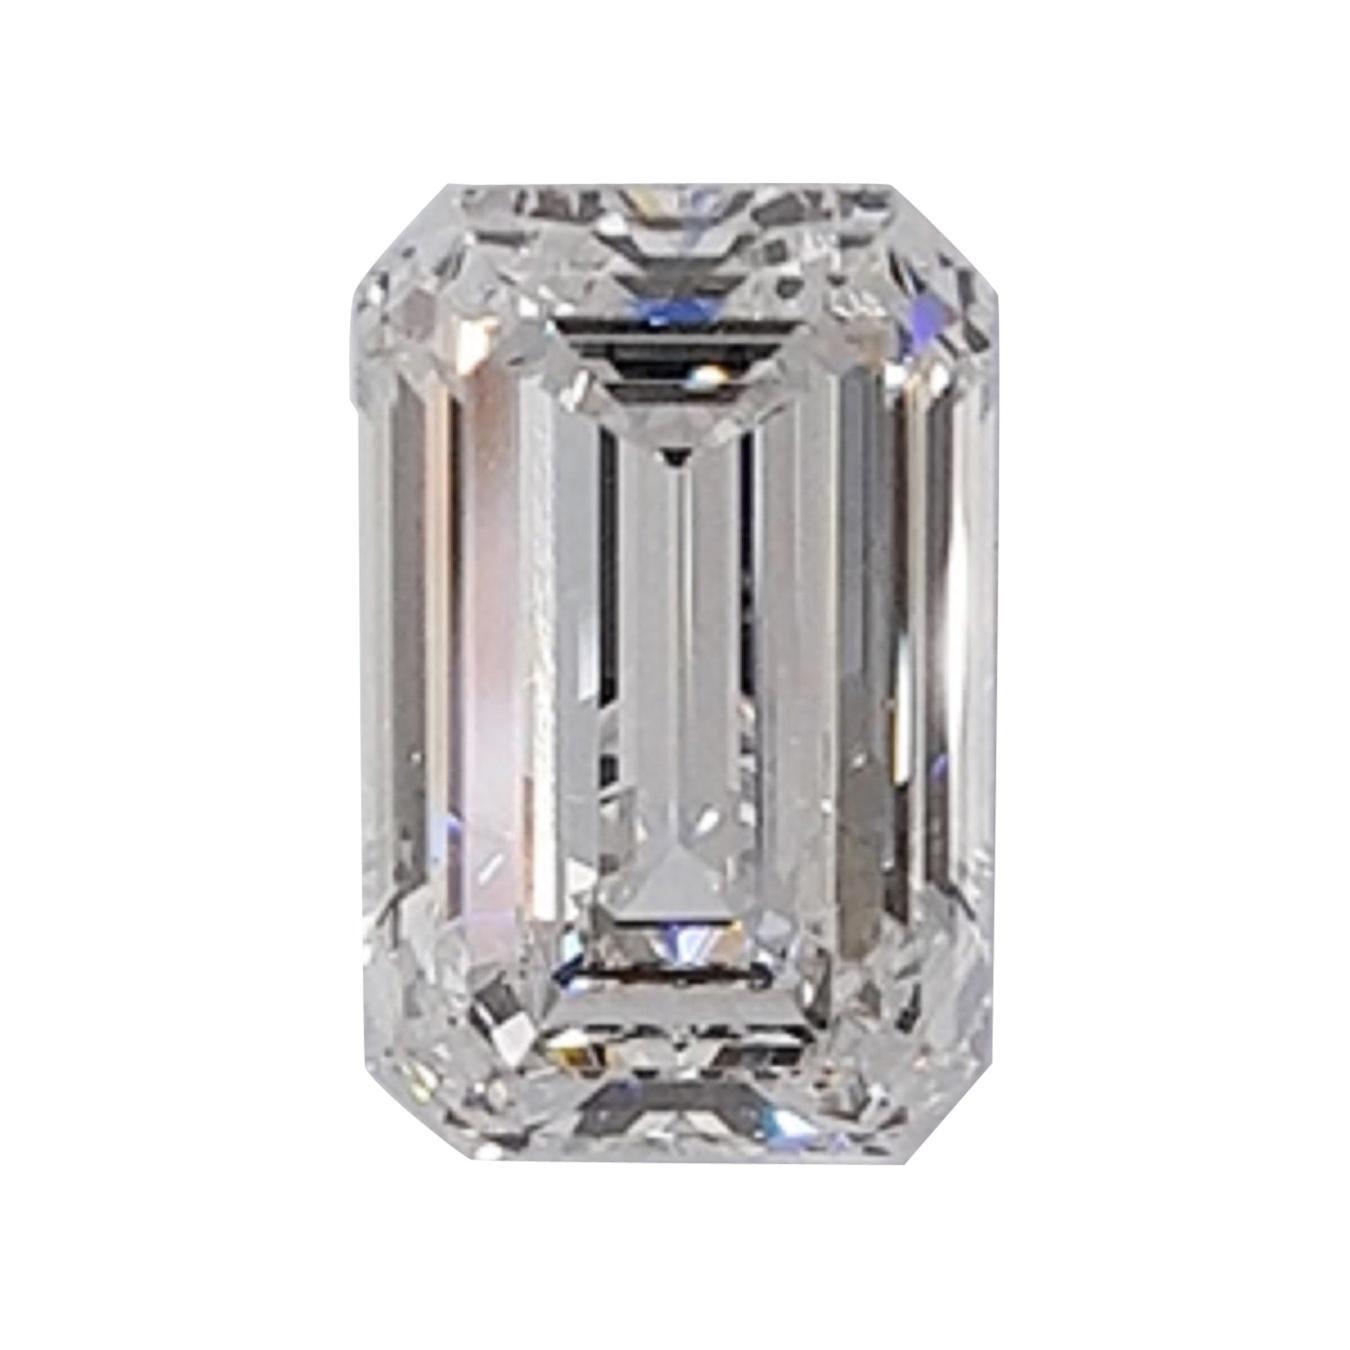 GIA Certified 10 Carat Emerald Cut Diamond Perfect Proportion VVS1 Clarity